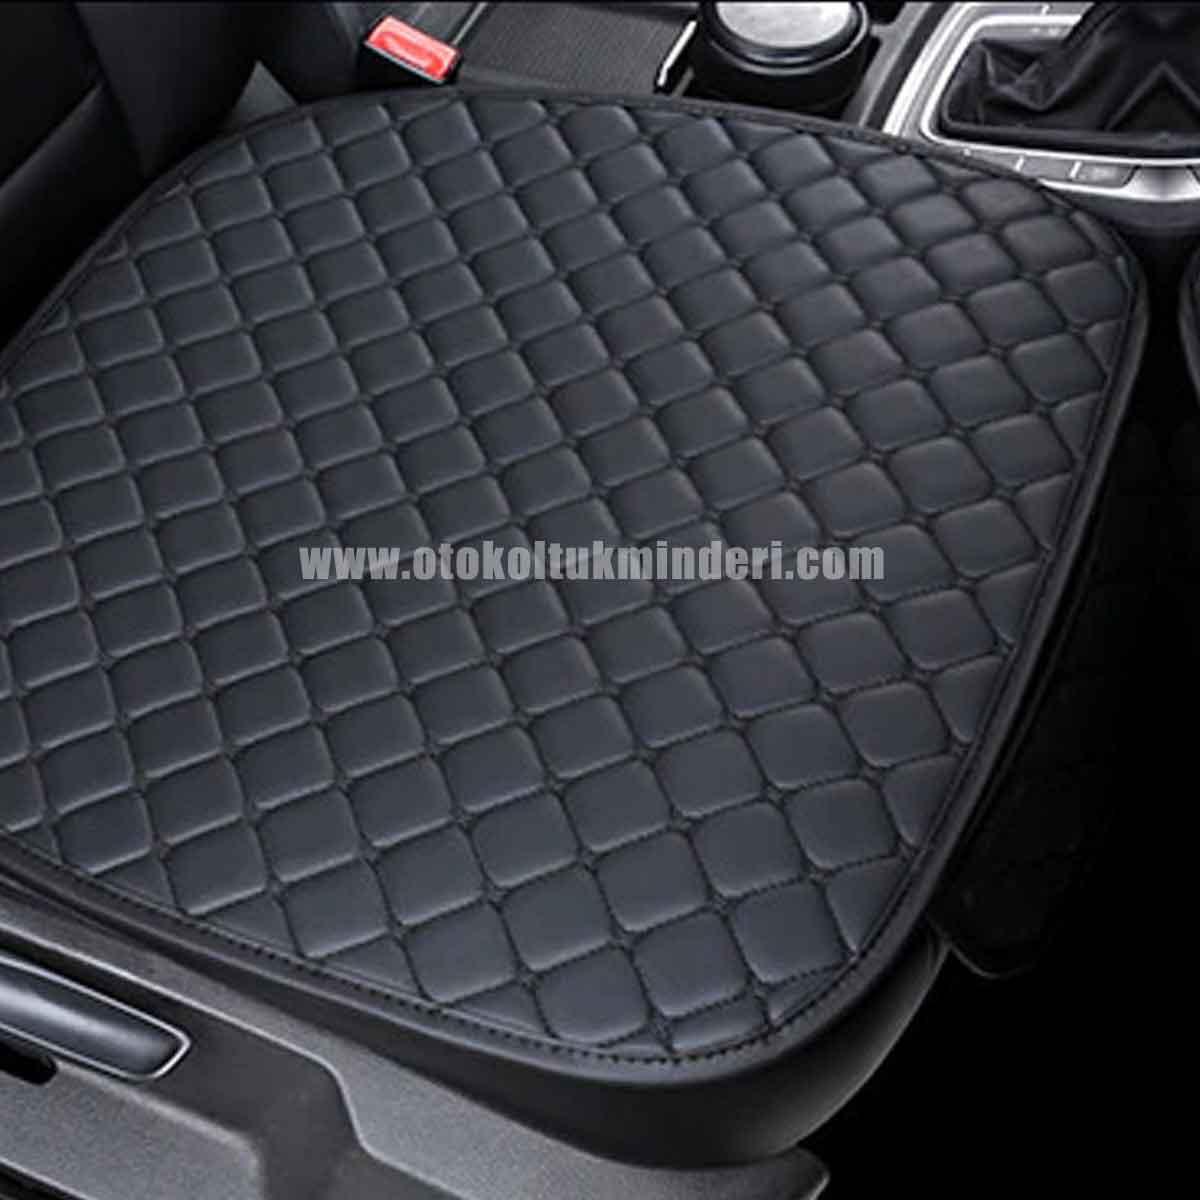 Honda oto koltuk kılıfı - Honda Koltuk minderi Siyah Deri Cepli